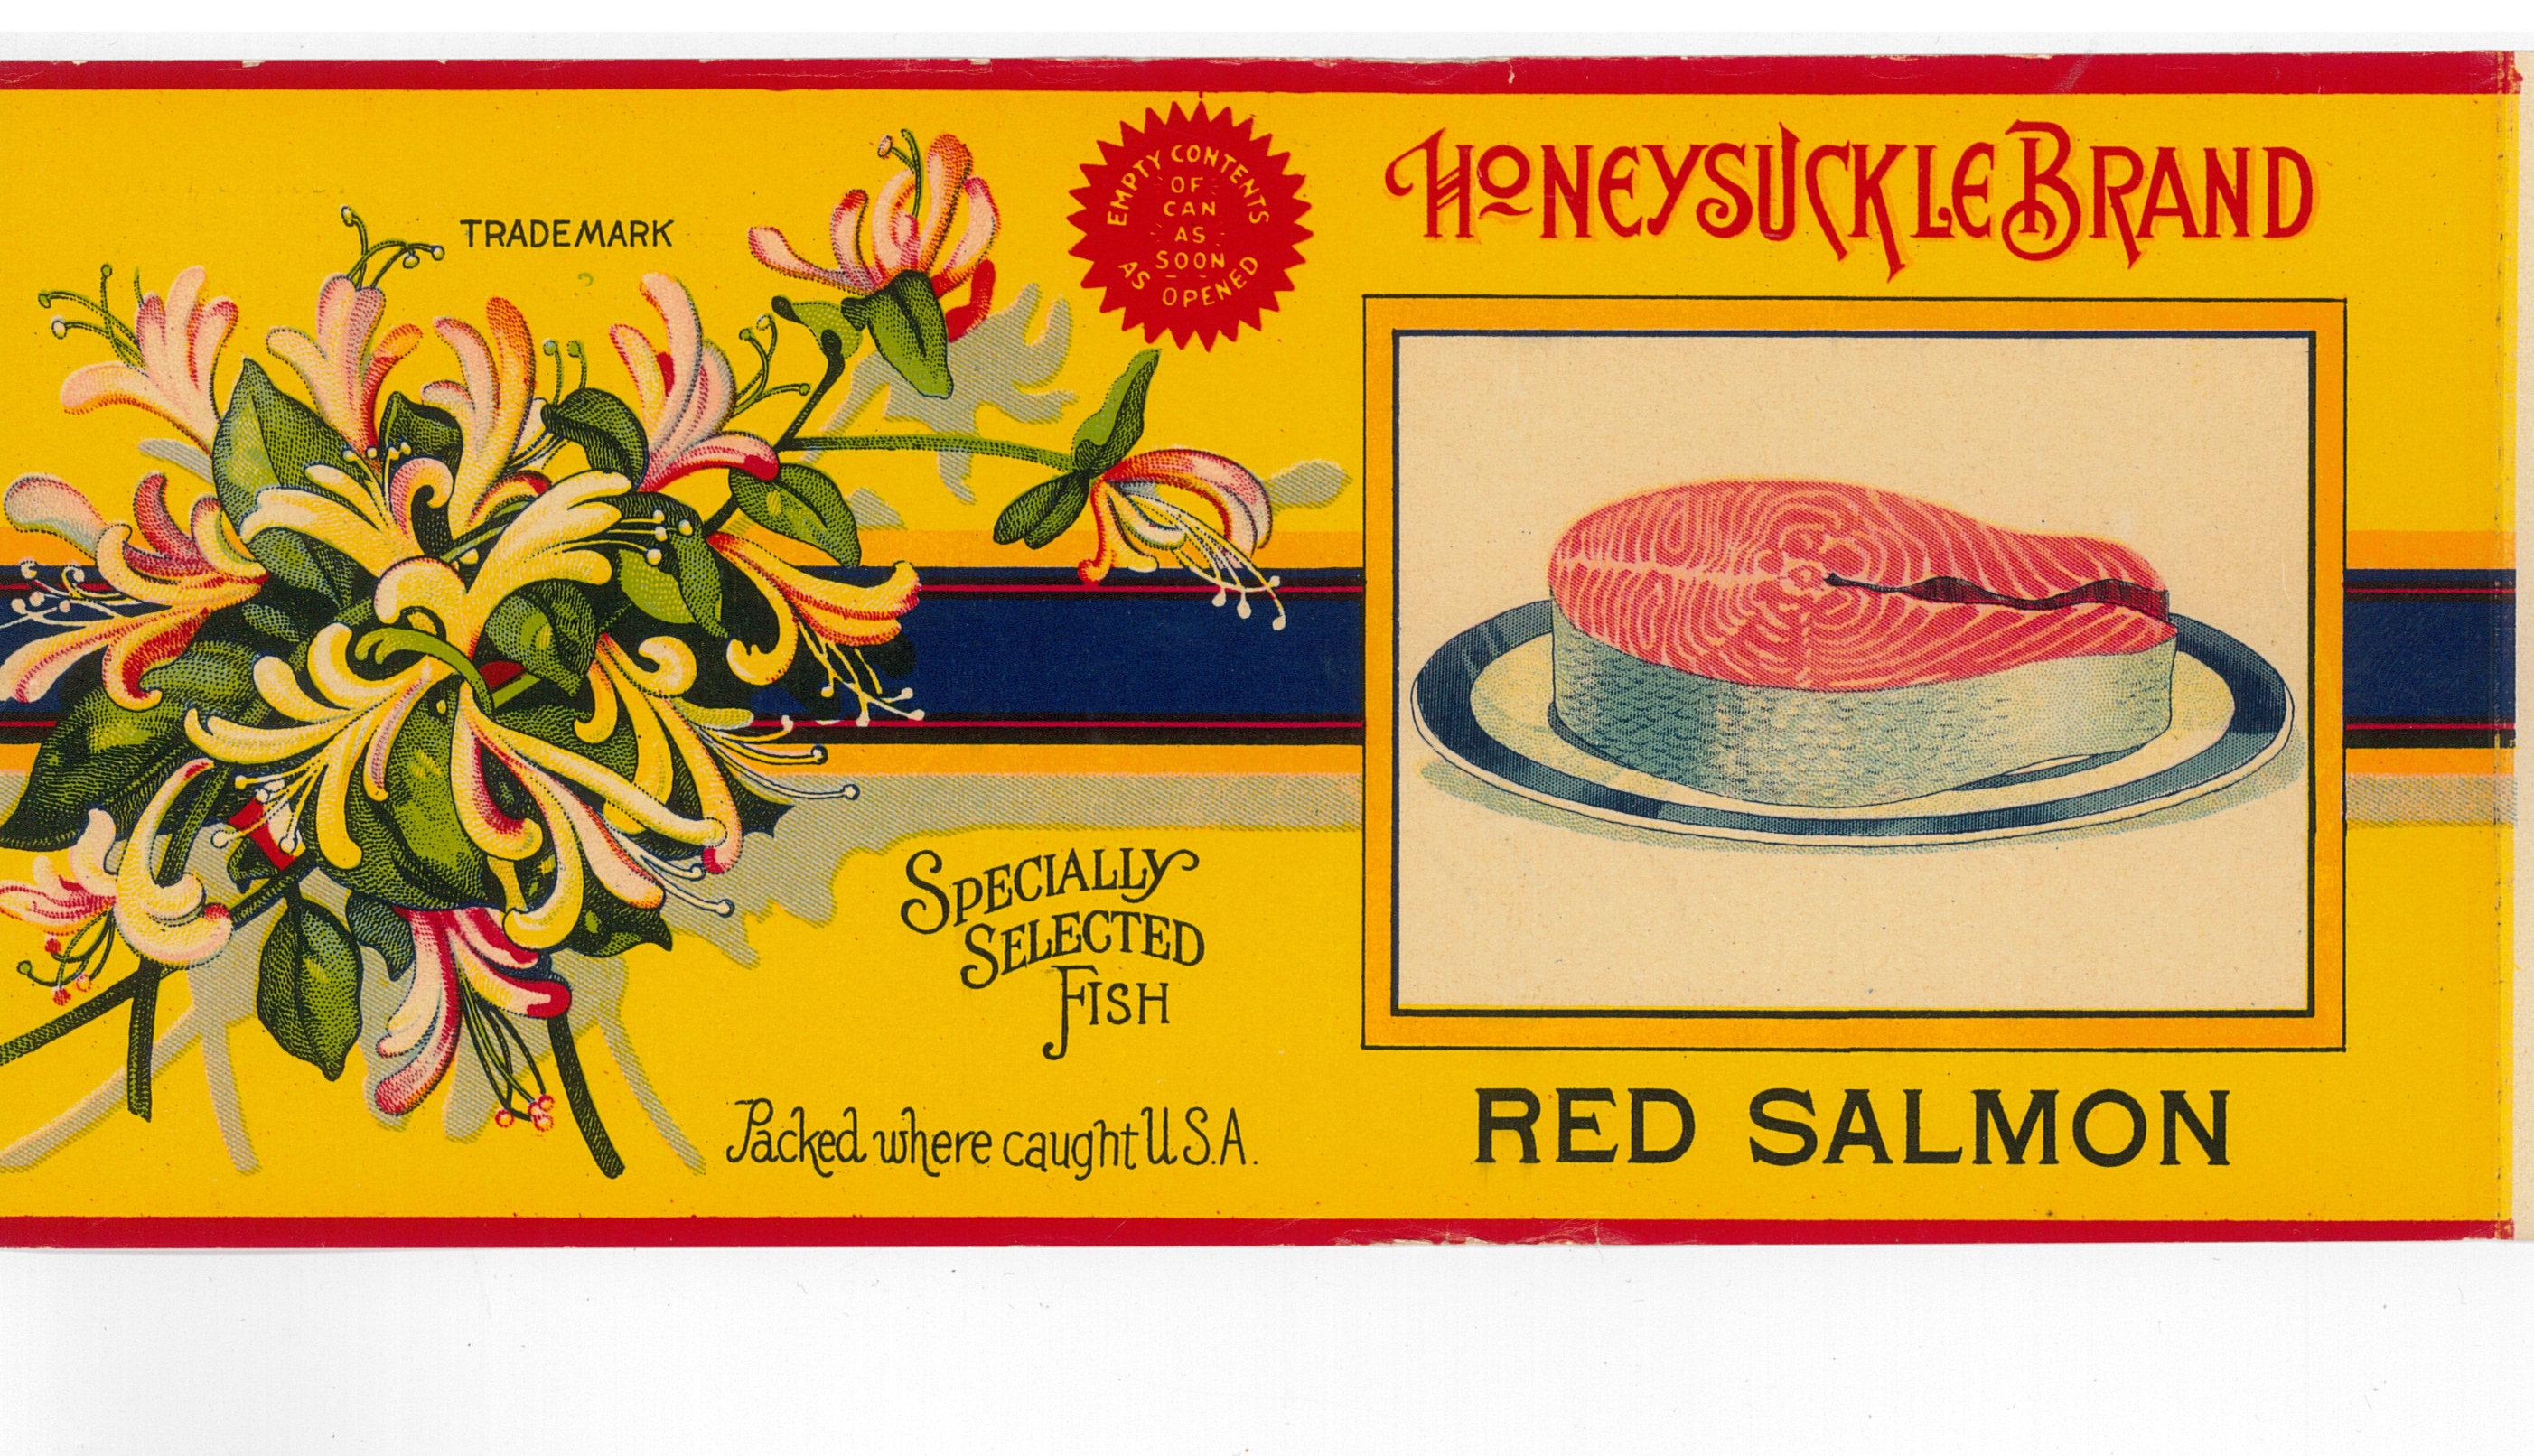 Canned salmon label courtesy of Karen Hofstad